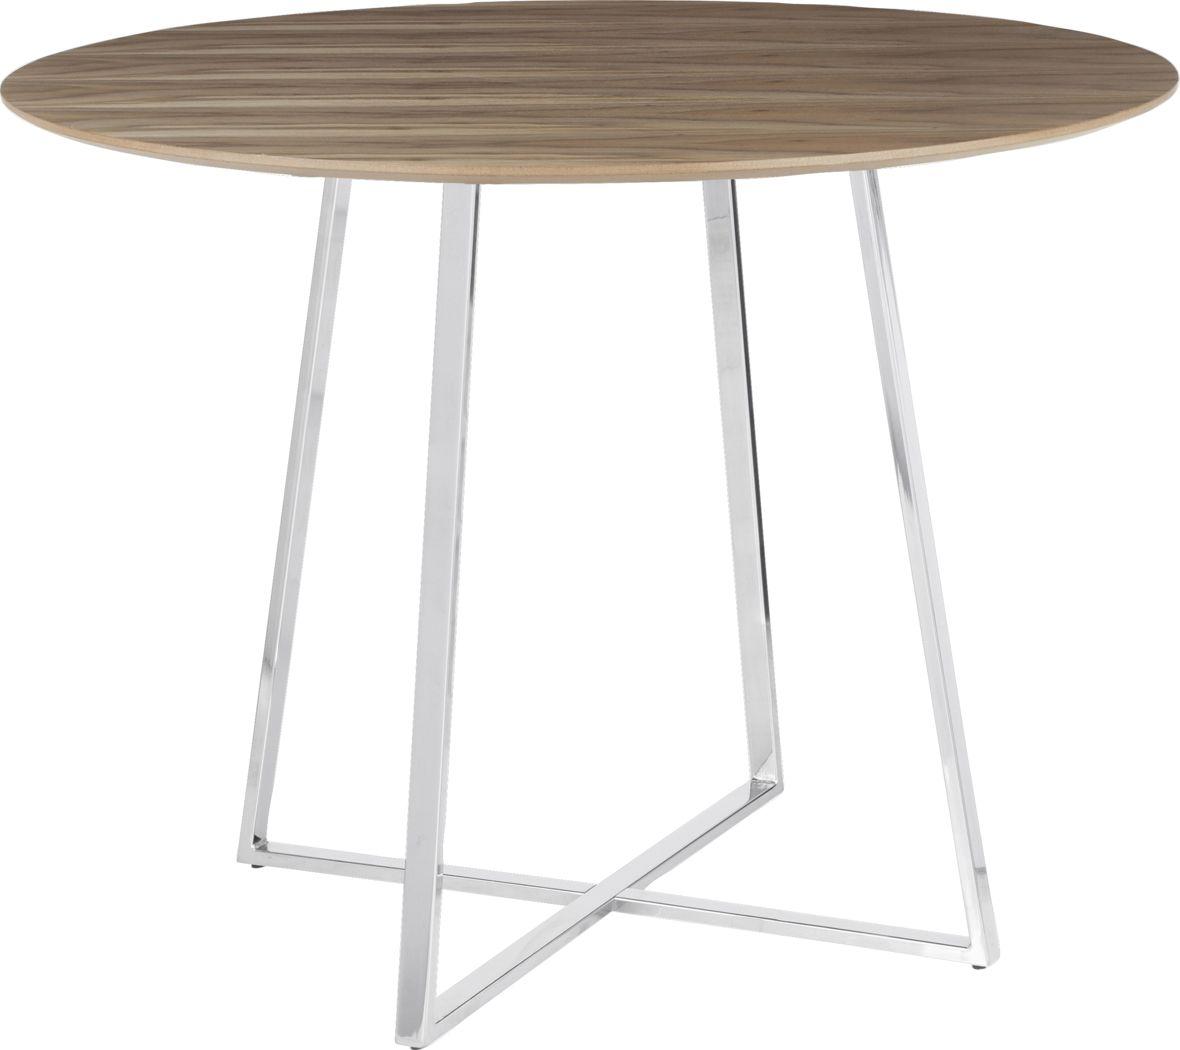 Ovalla Chrome Dining Table